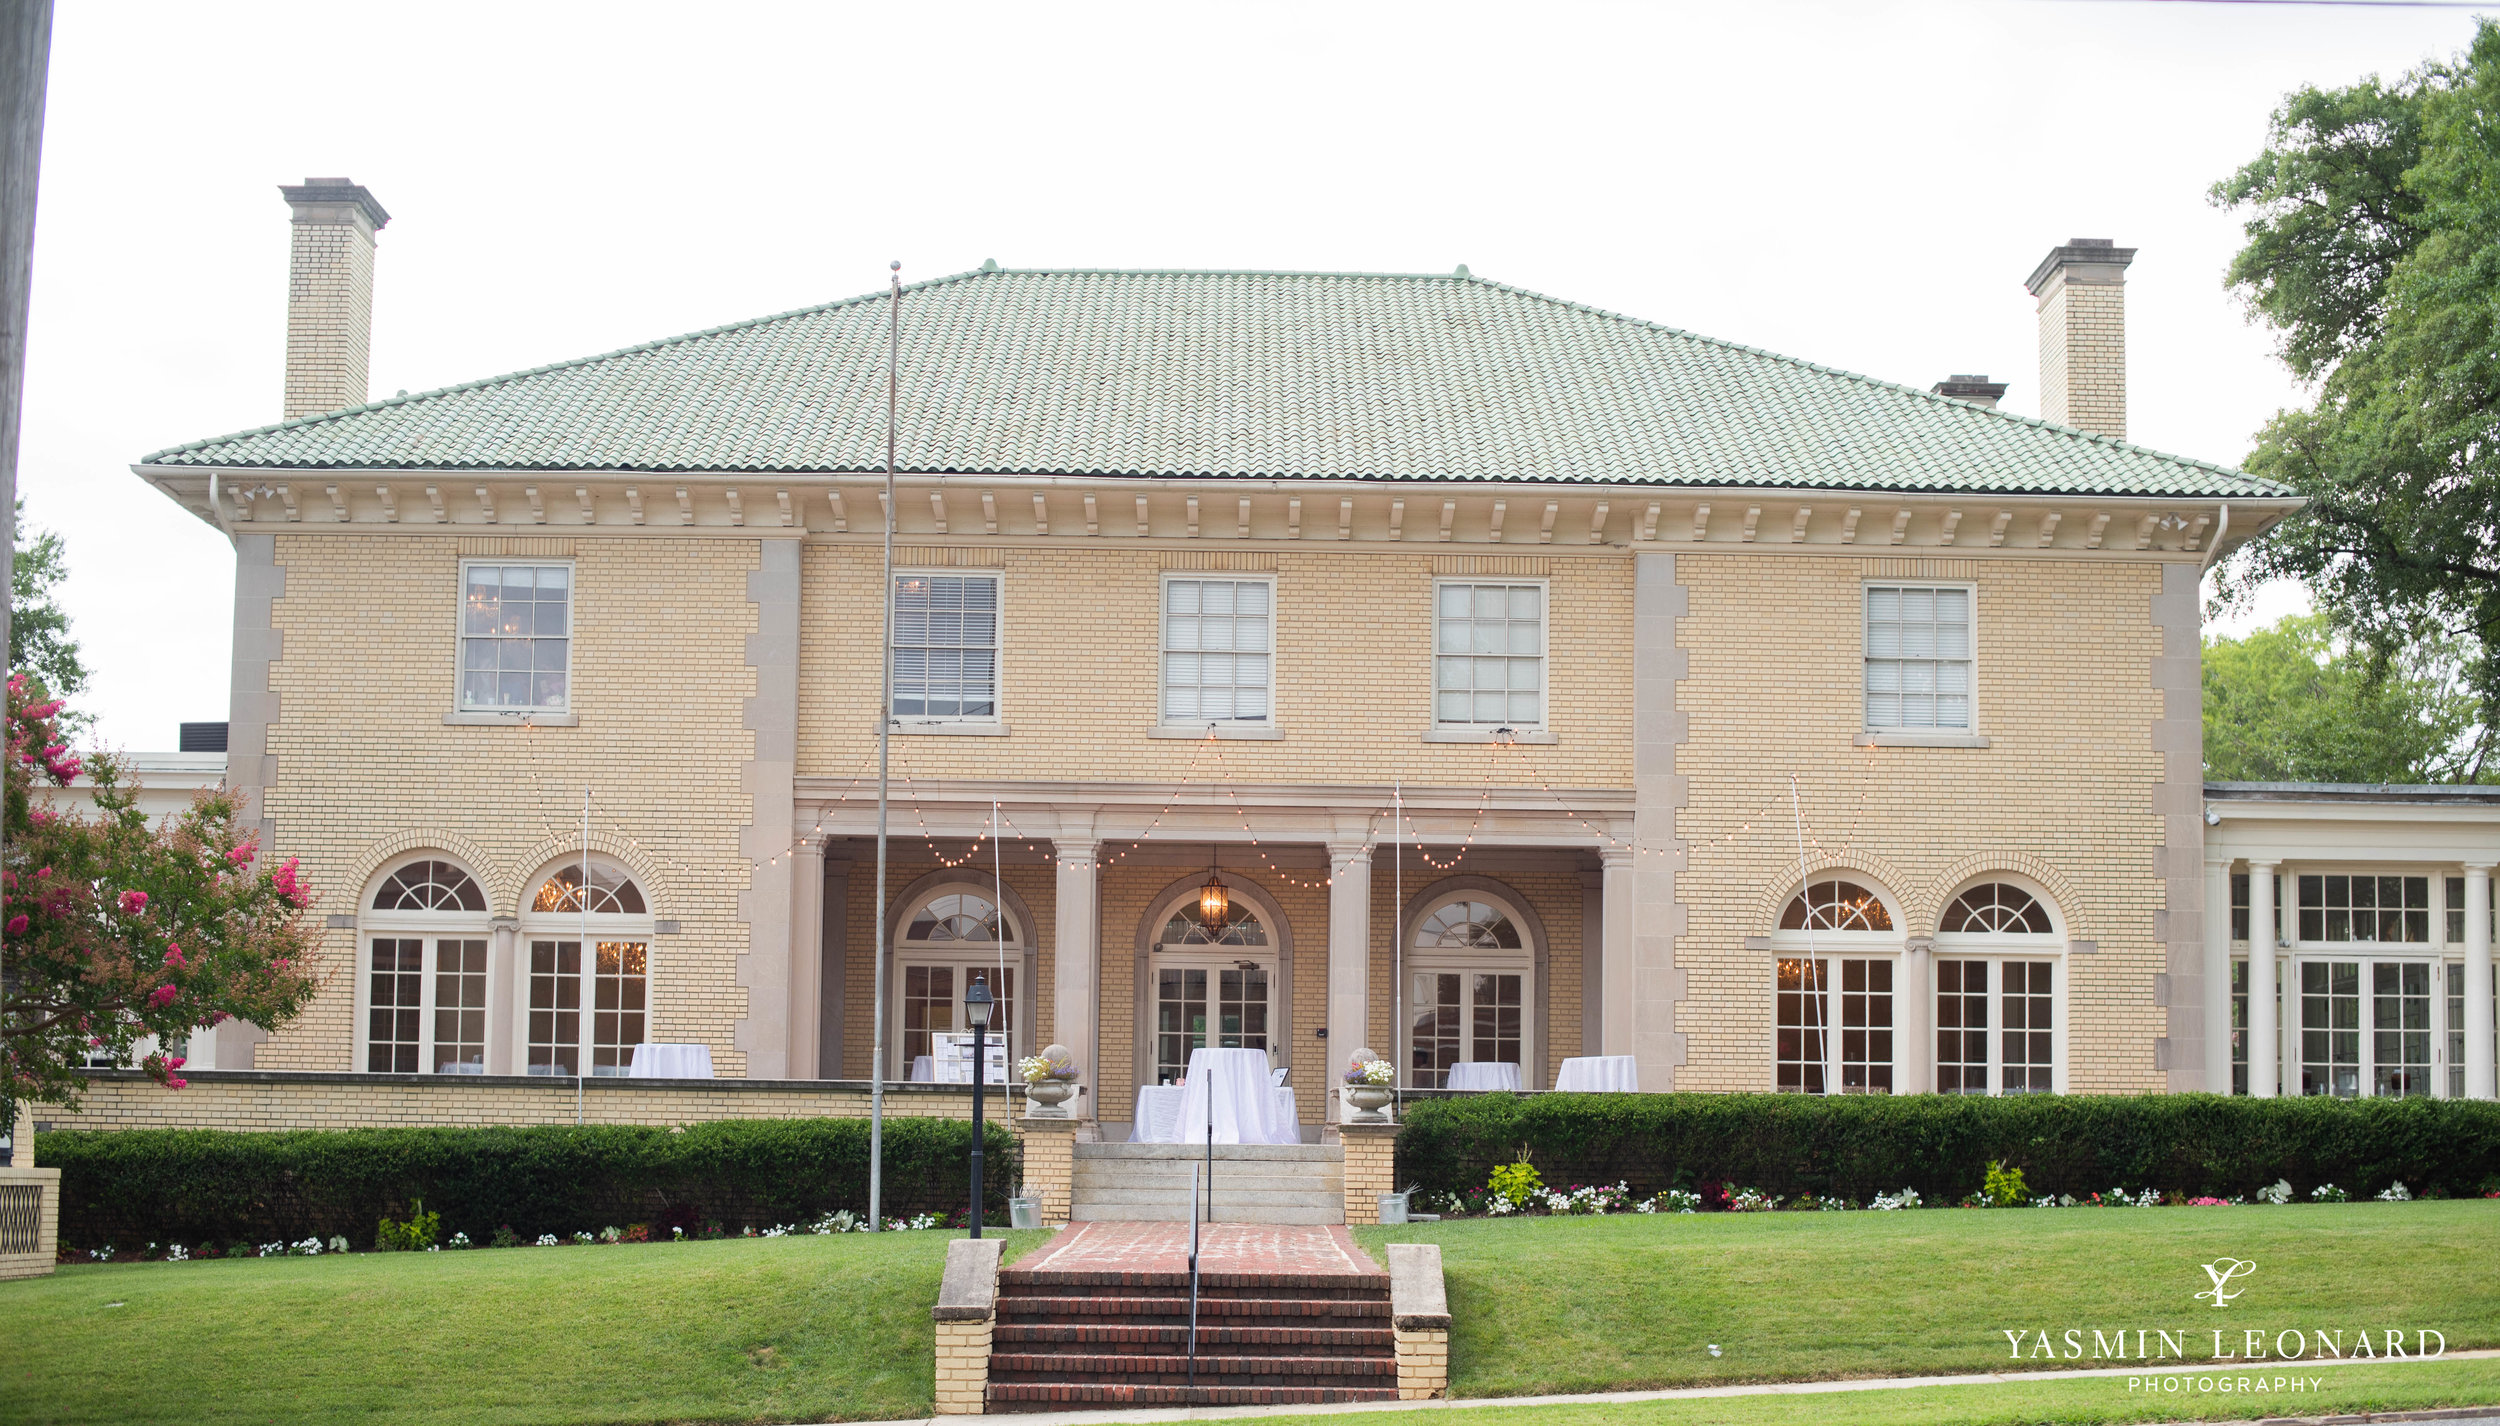 Separk Mansion - NC Weddings - Gastonia Wedding - NC Wedding Venues - Pink and Blue Wedding Ideas - Pink Bridesmaid Dresses - Yasmin Leonard Photography-1.jpg